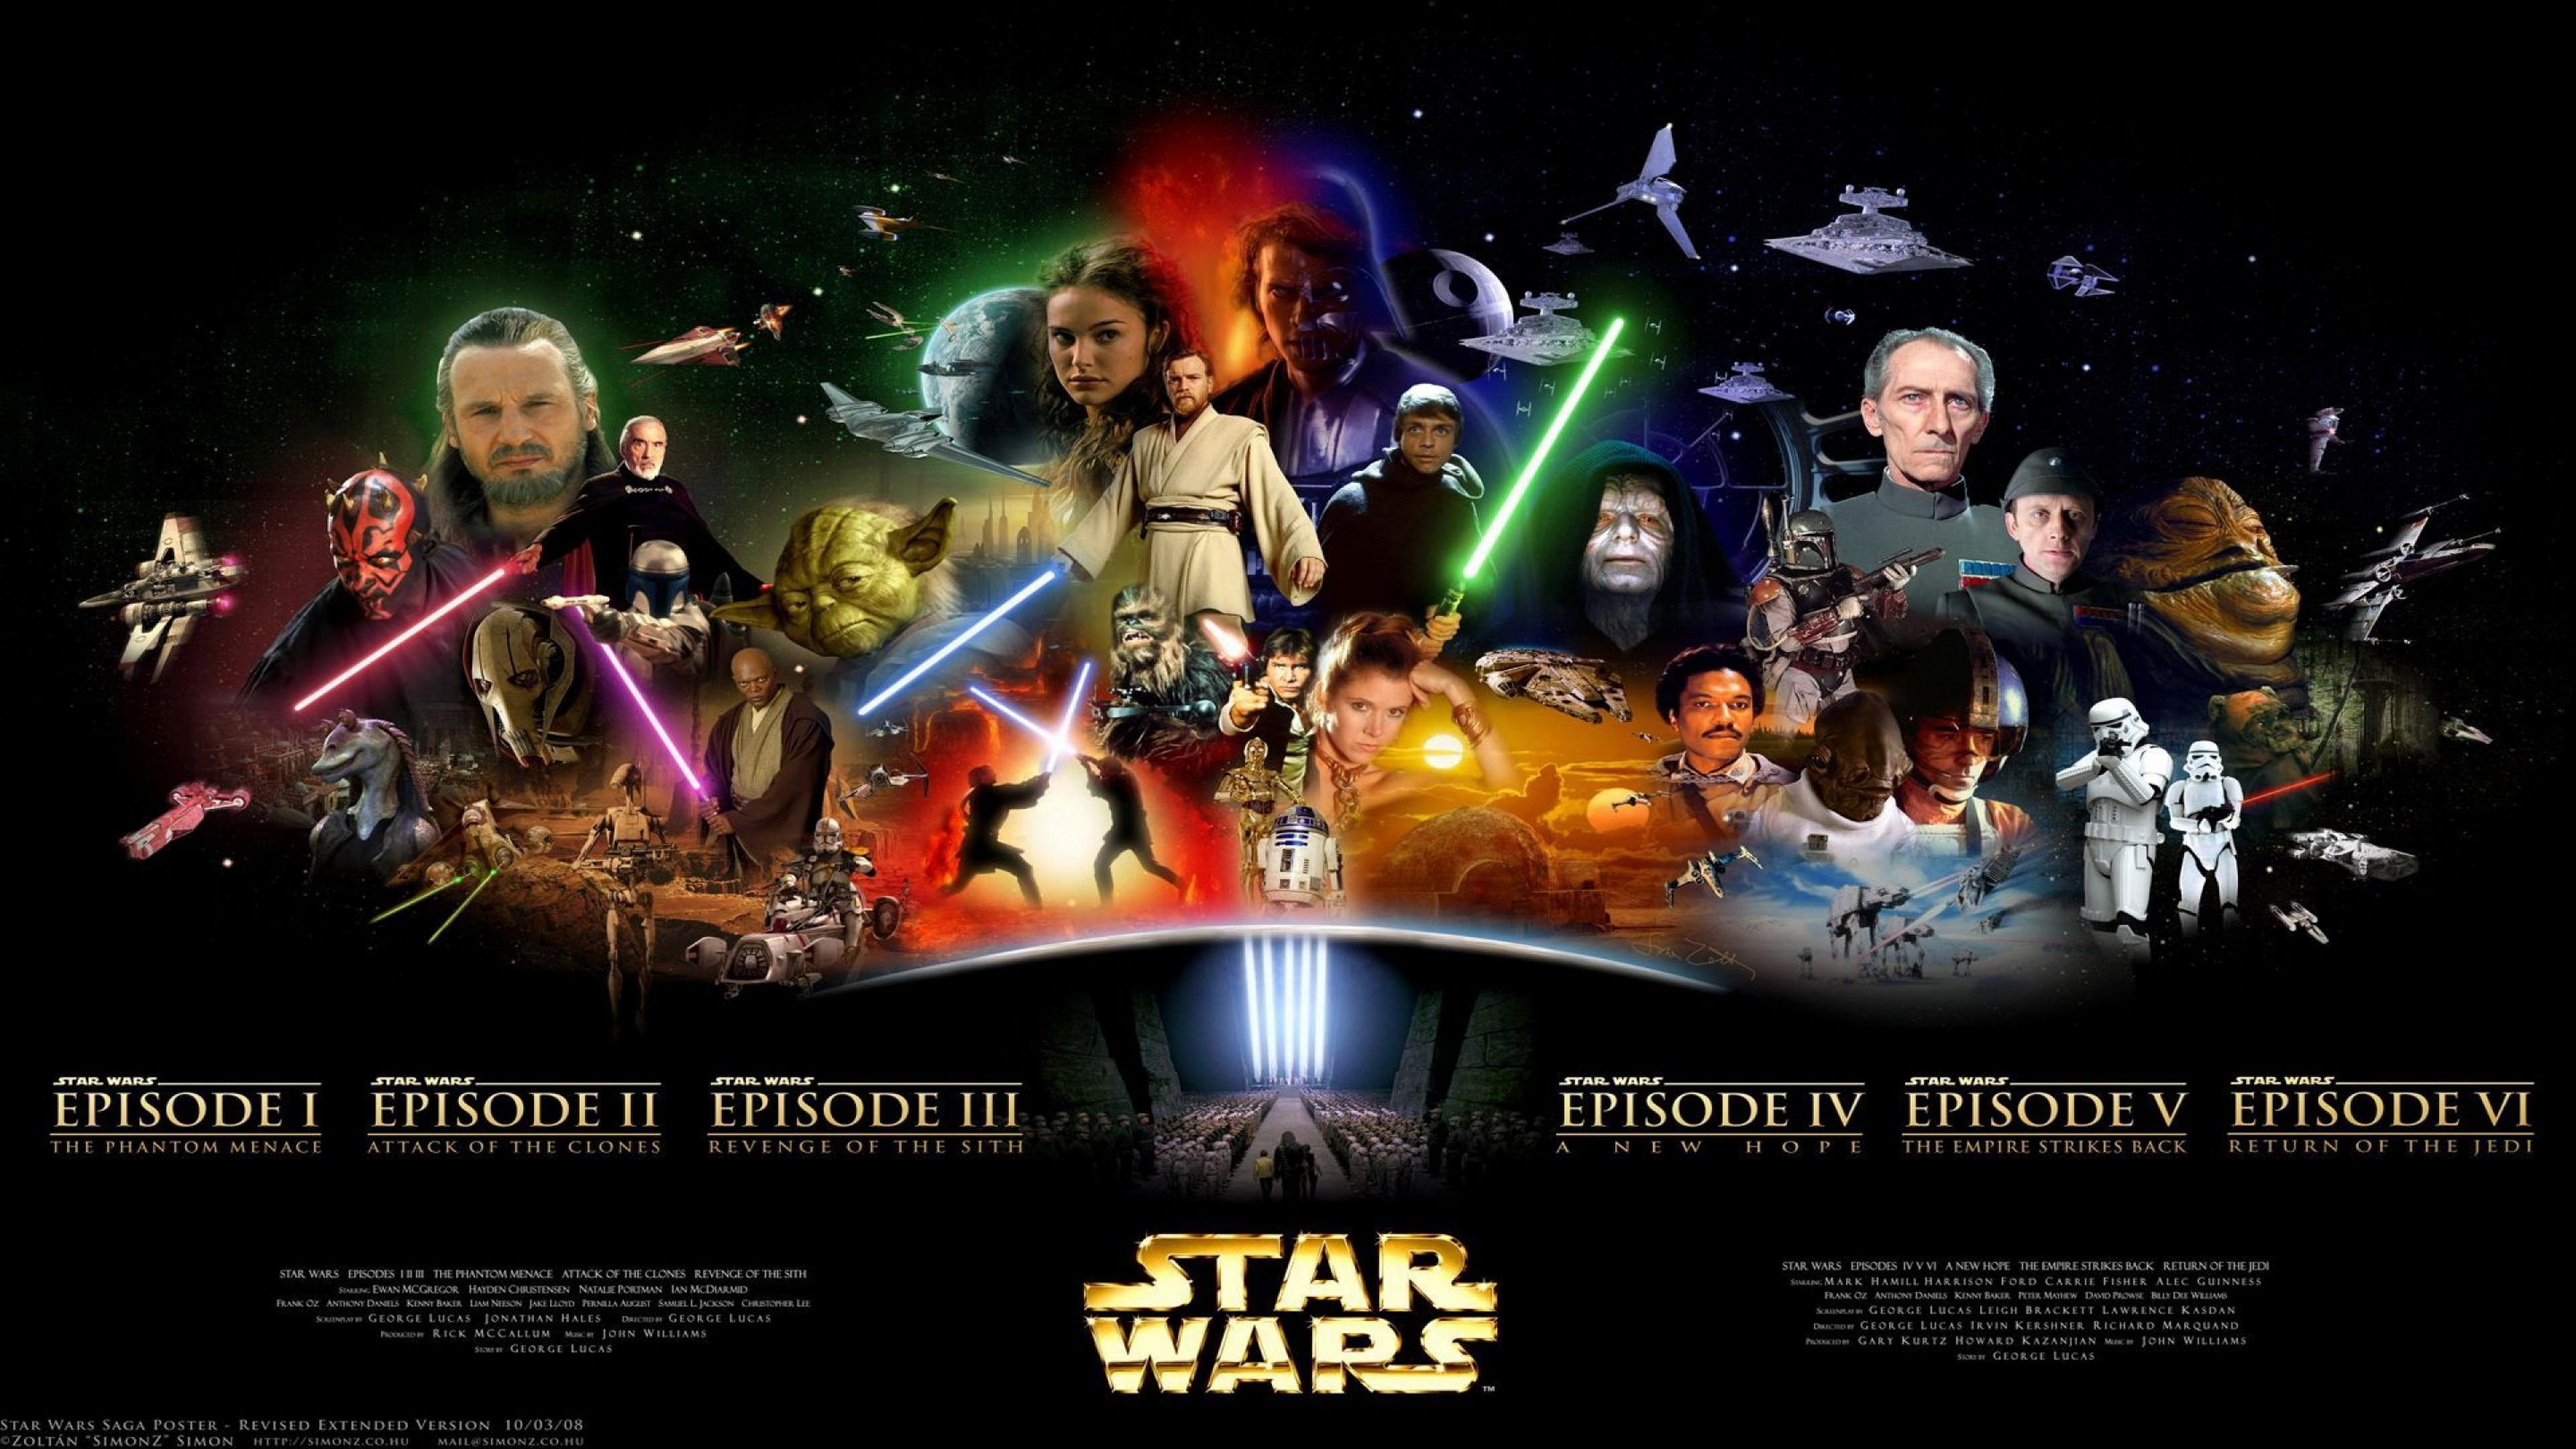 Star Wars Ultra HD 4k Wallpaper   HD Wallpapers Ultra HD Wallpapers 3840x2160